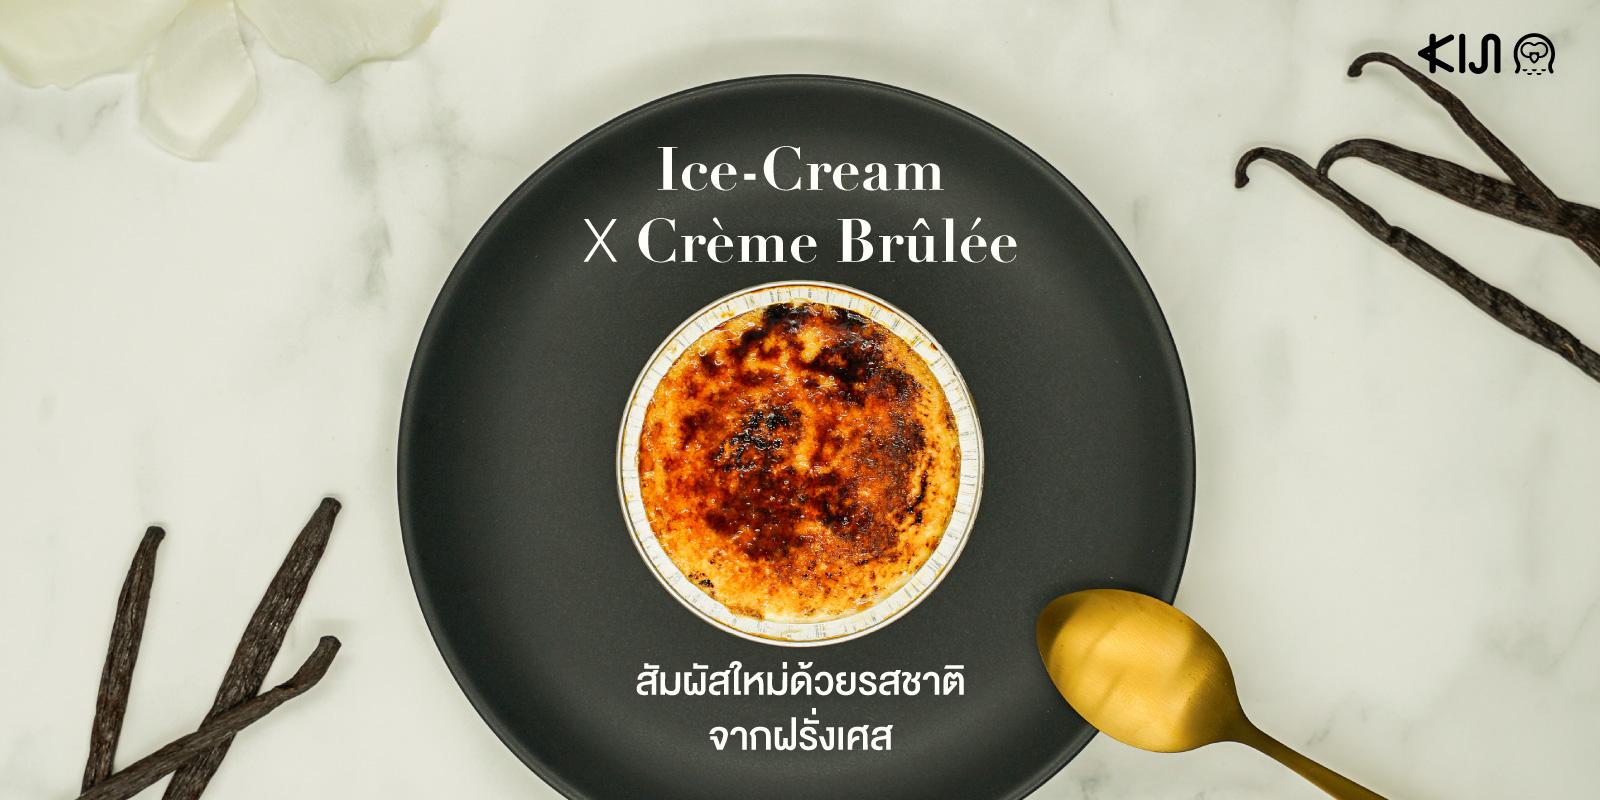 Premium Creme Brulee Ice ไอศกรีมสูตรที่คิดค้นขึ้นพิเศษของร้าน Pleinbon